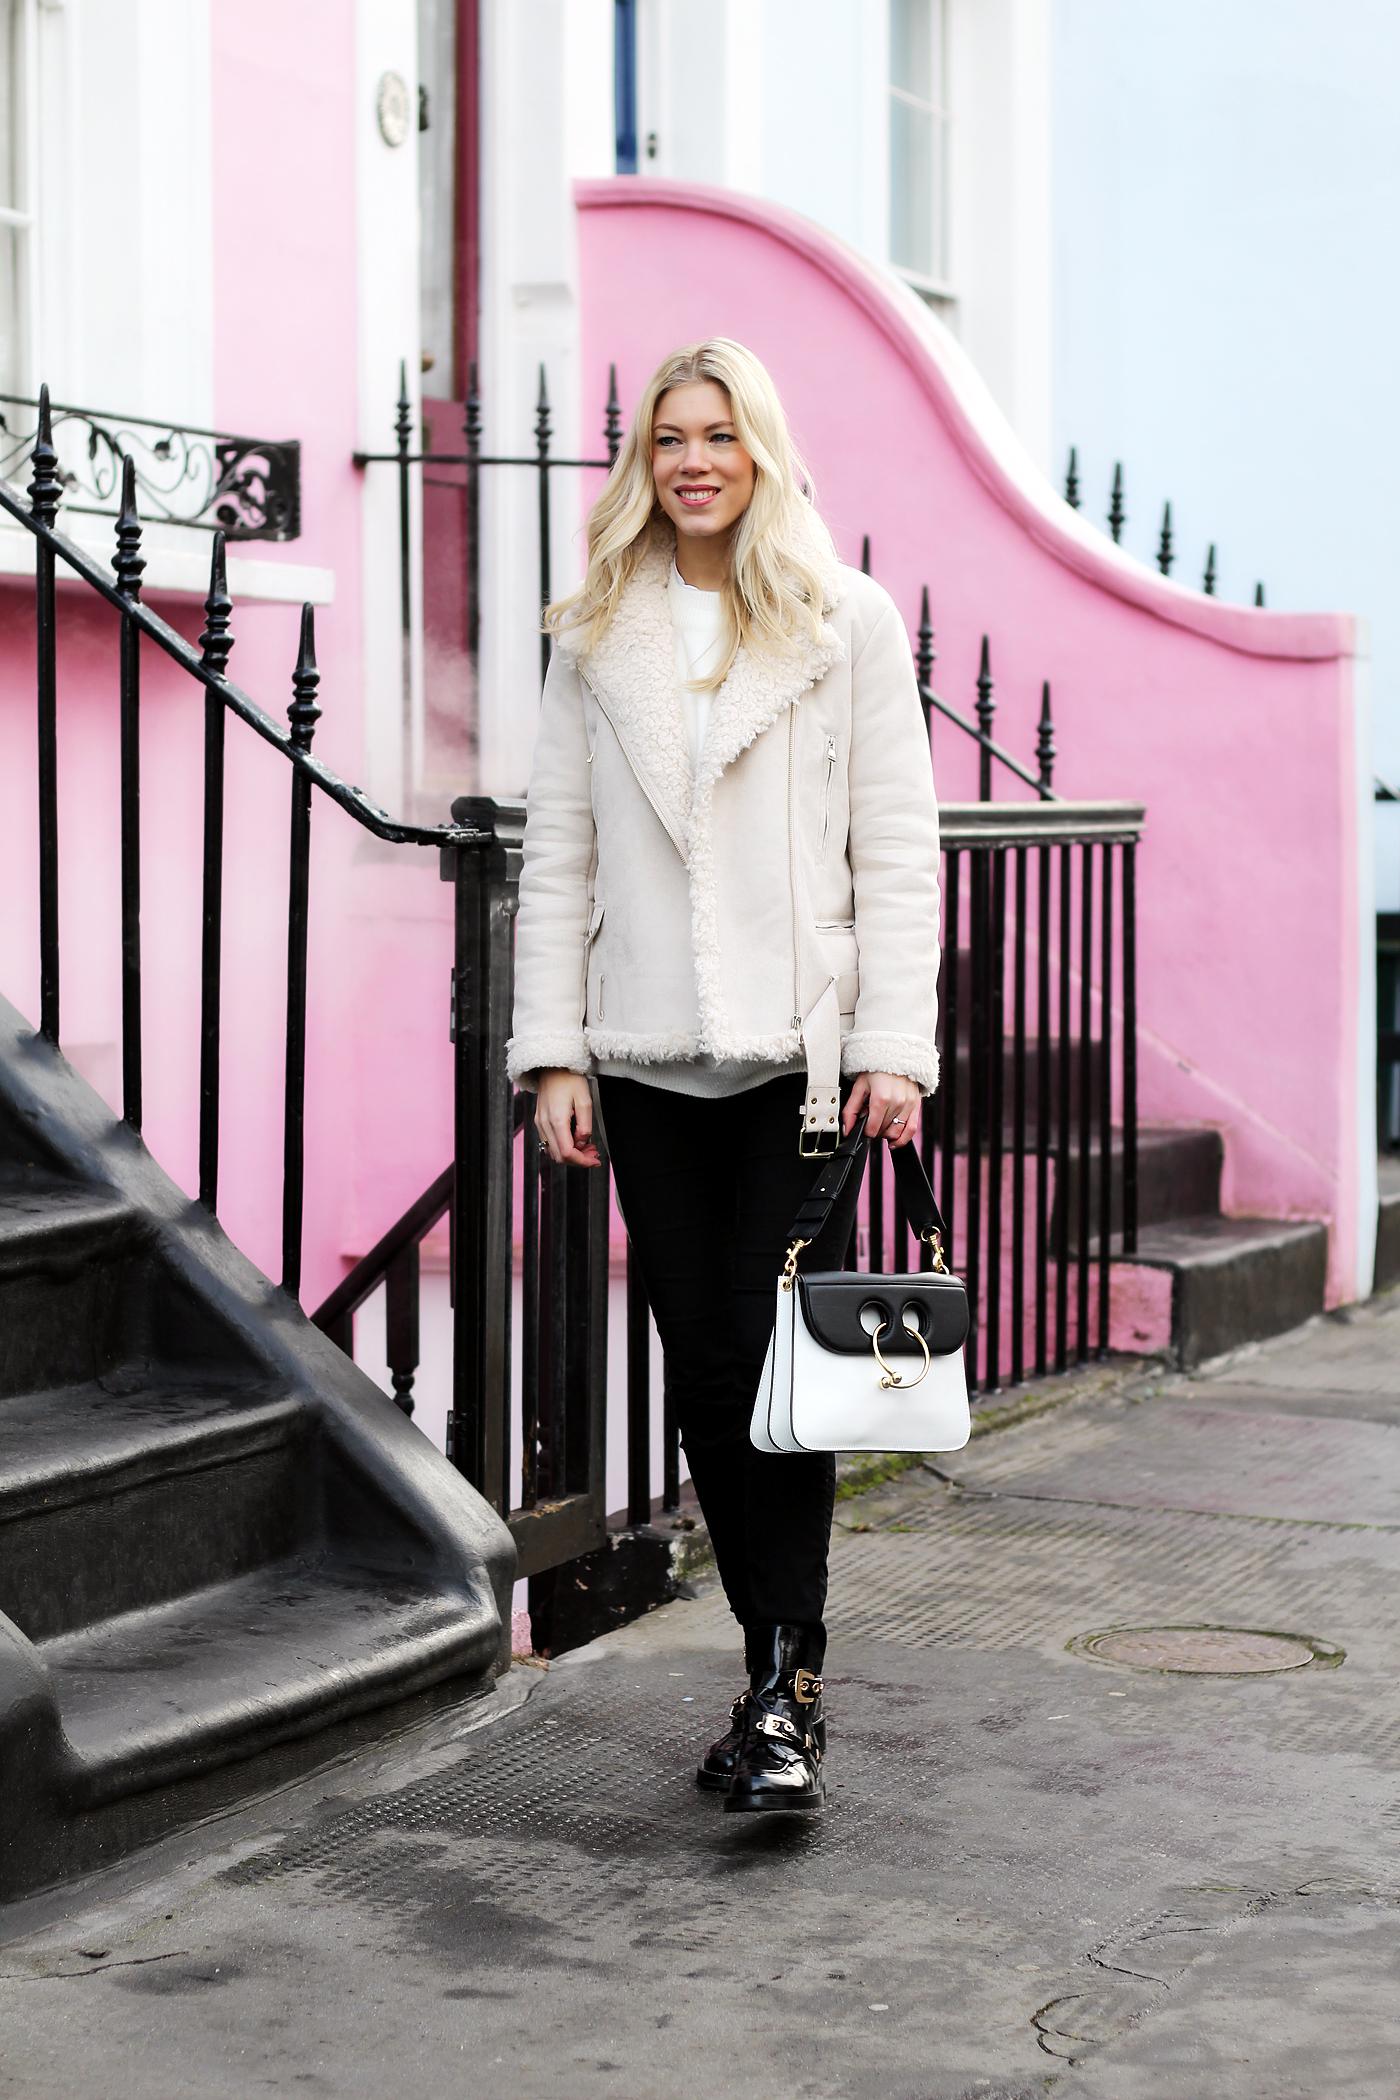 somehappyshoes_London_Zara_Biker_jacket_Piercebag1